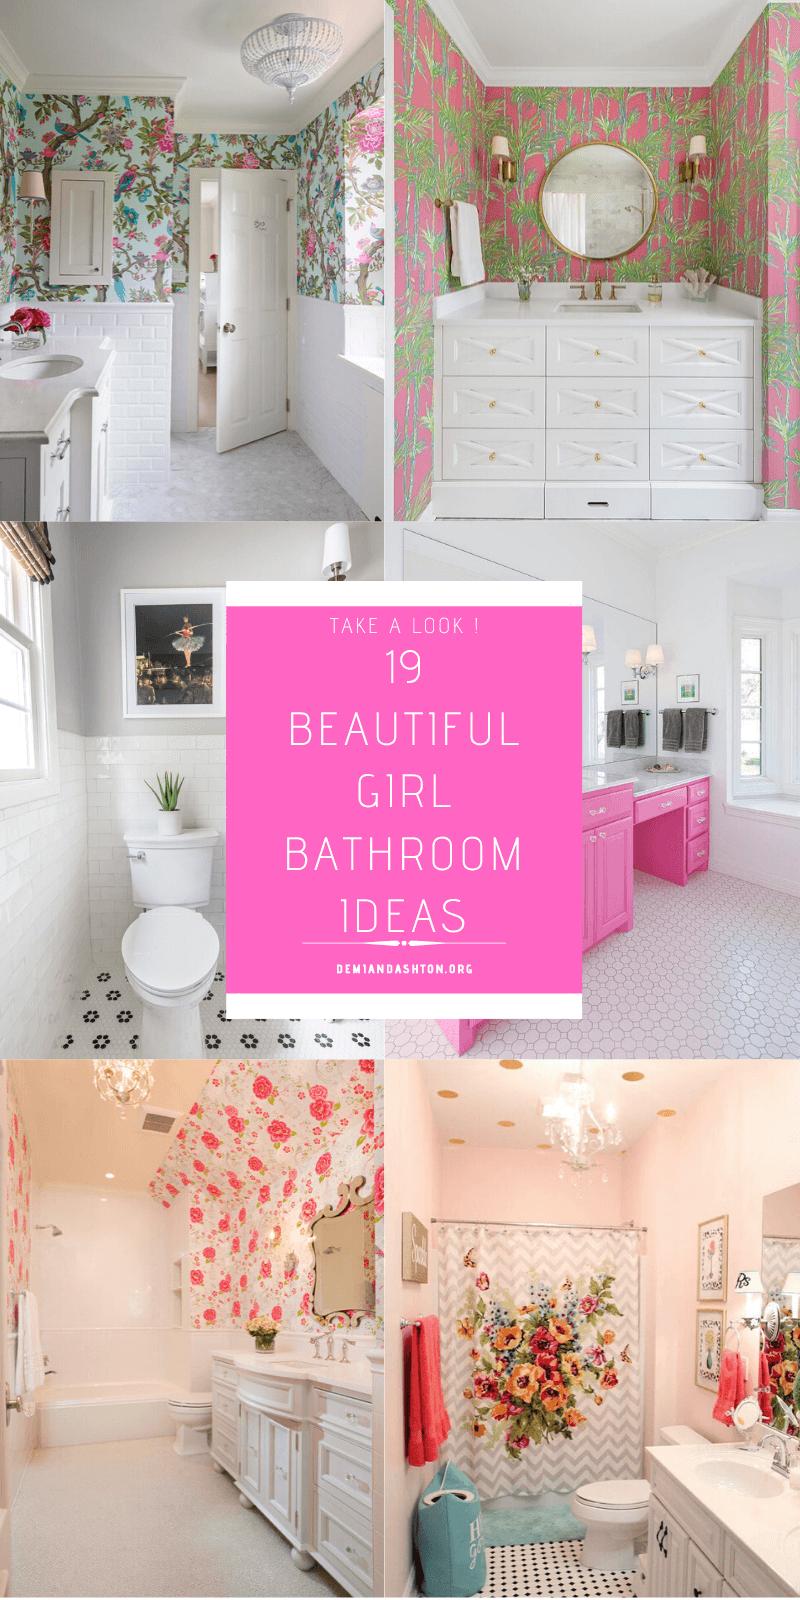 19 Beautiful Girl Bathroom Ideas For, Bathroom Ideas For Girls